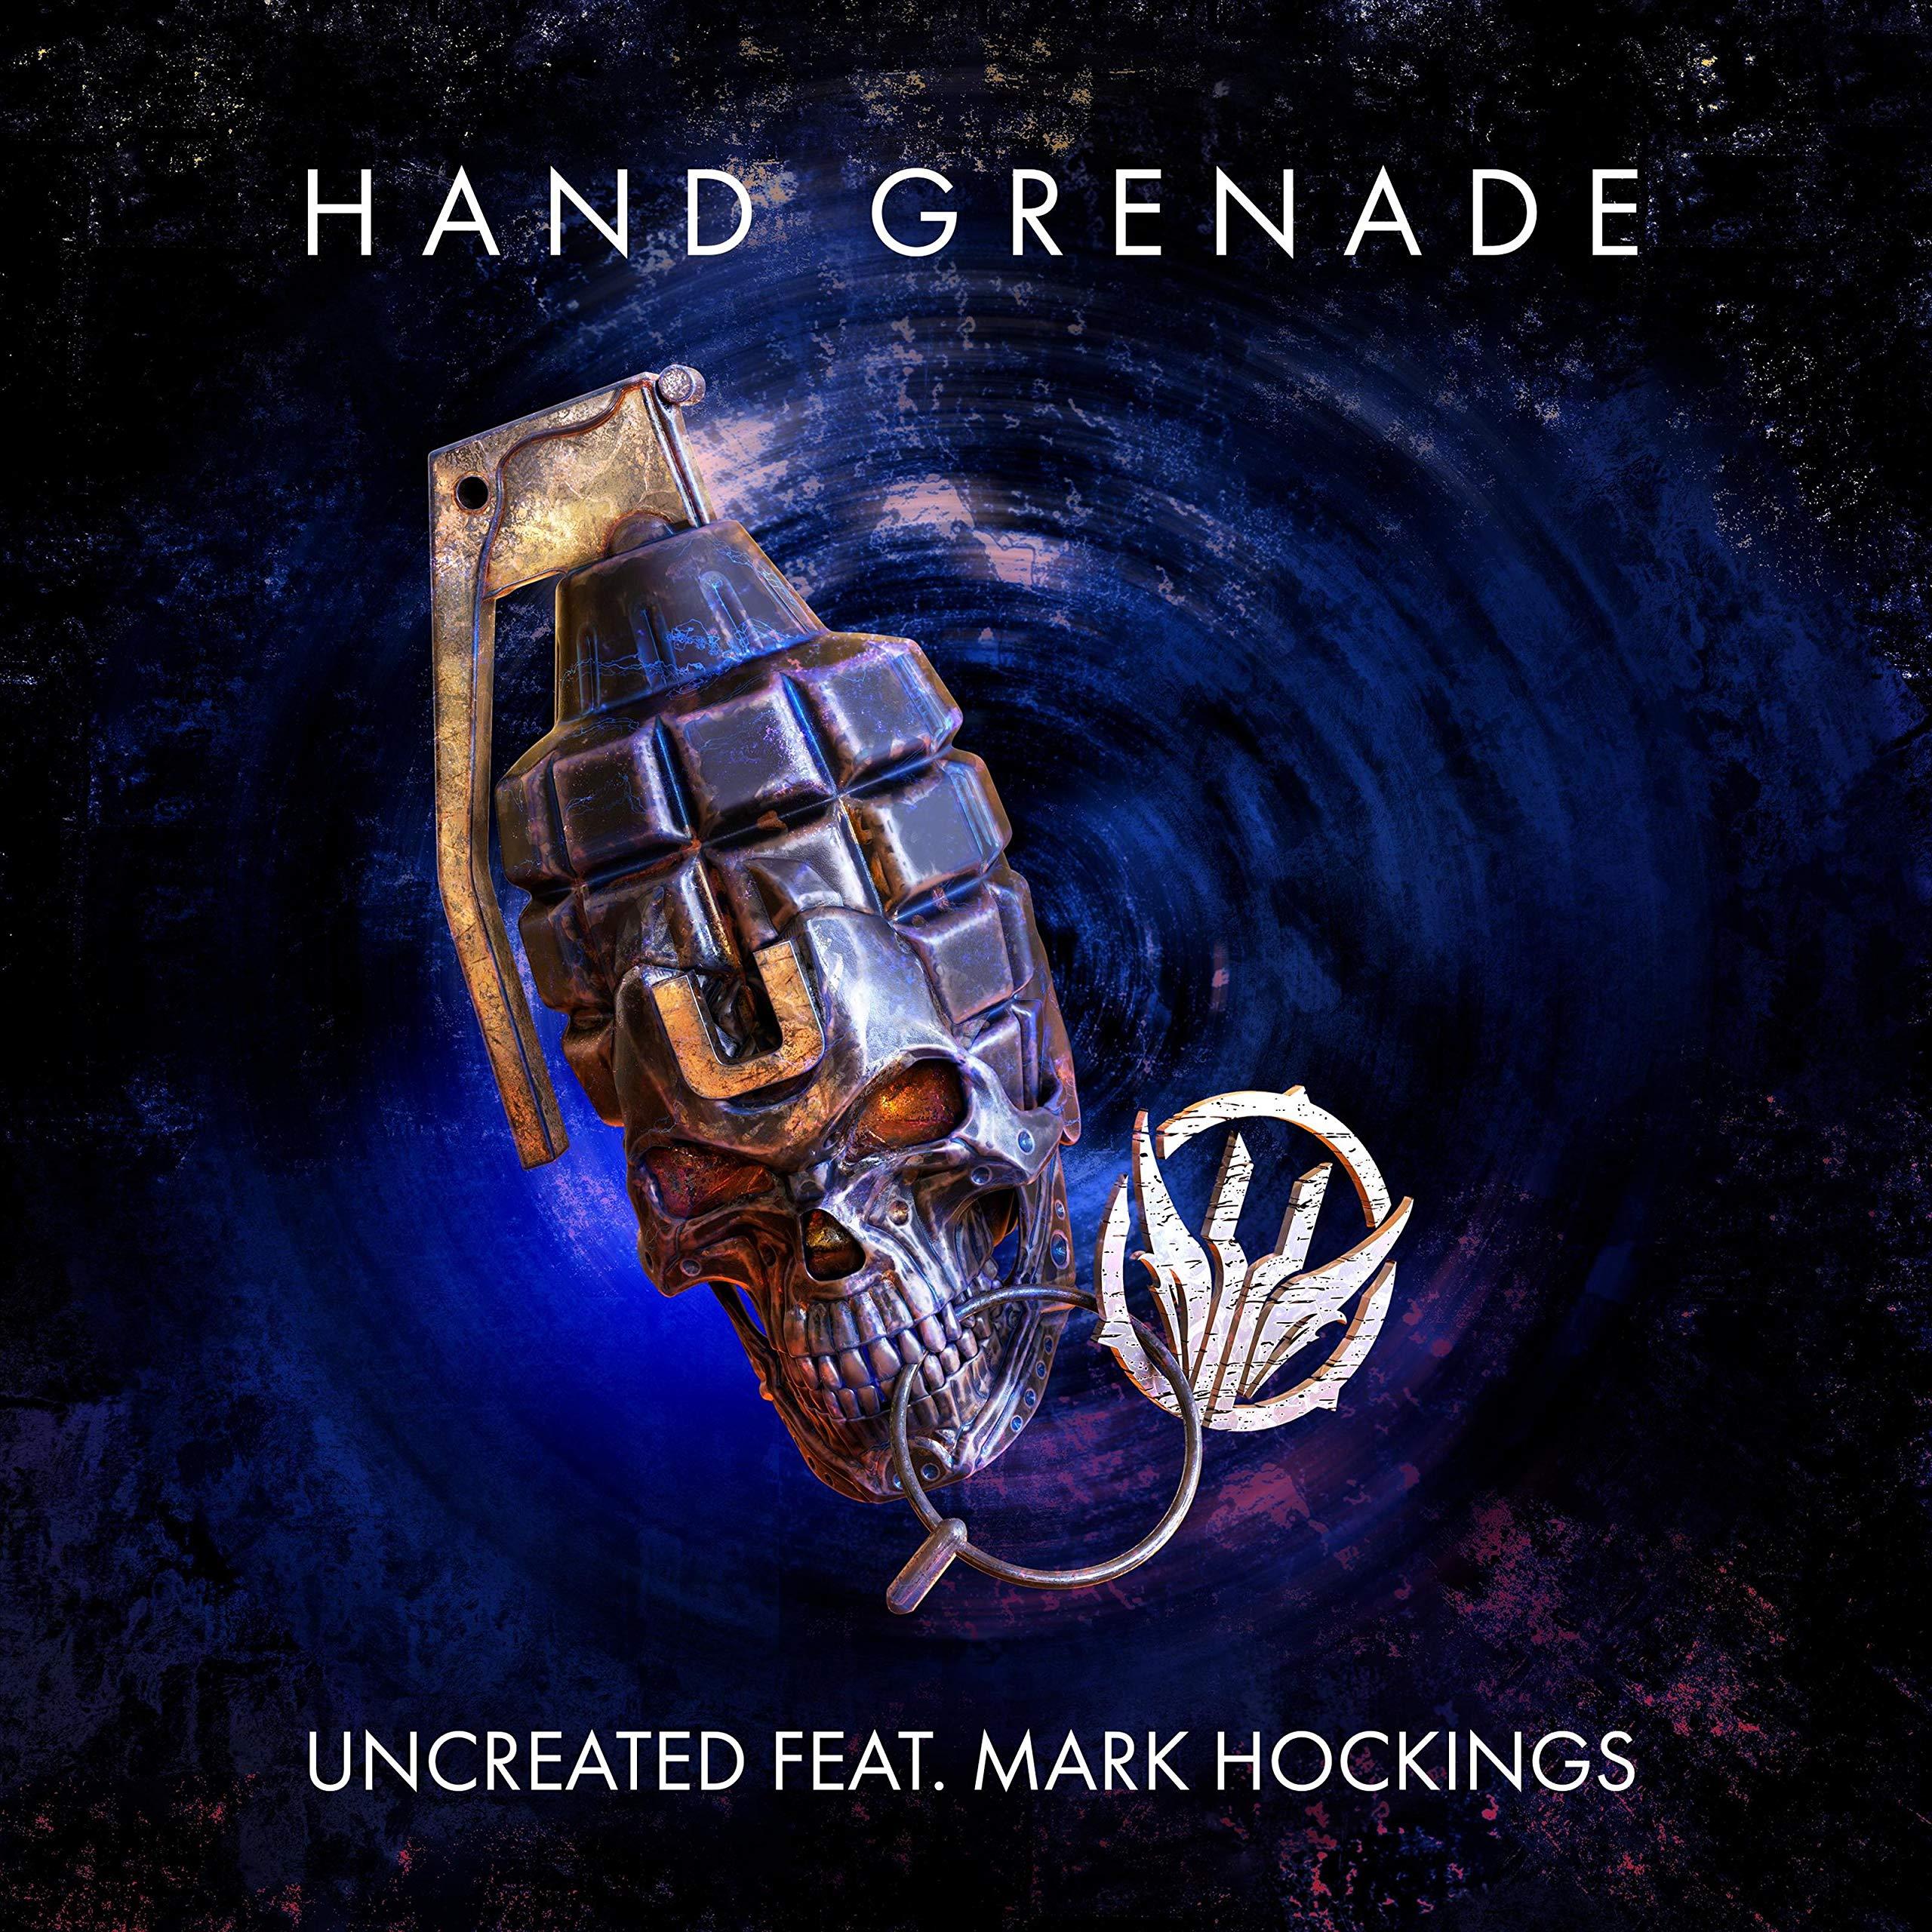 Uncreated - Hand Grenade (2021) [FLAC] Download